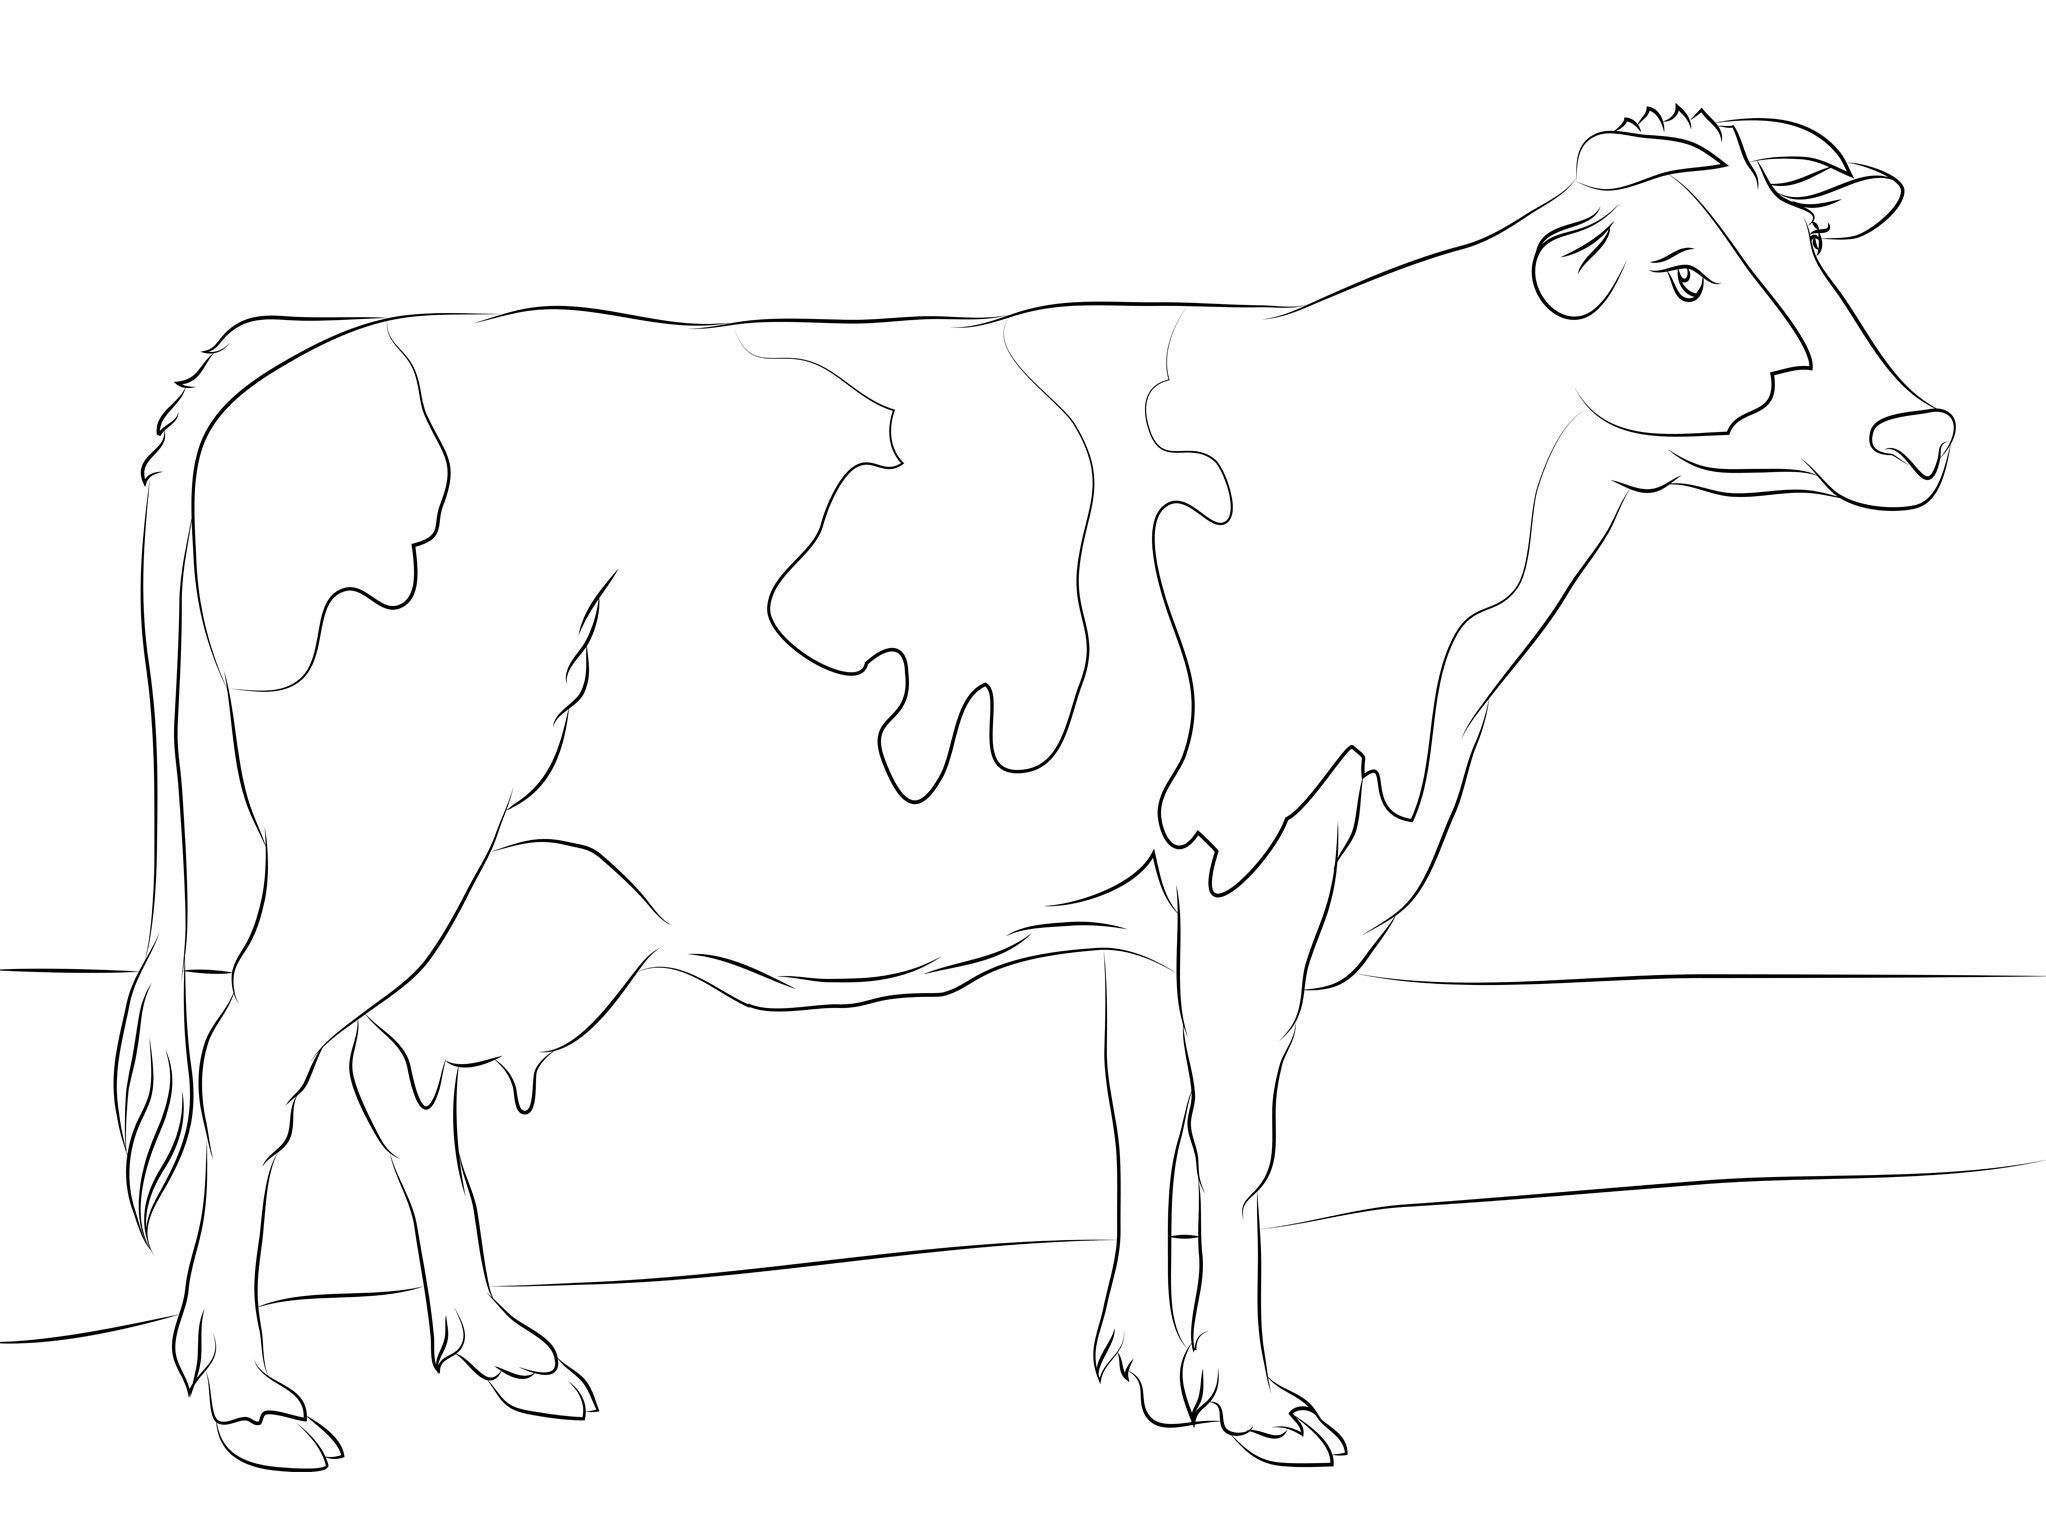 Pin By Shreya Thakur On Free Coloring Pages Cow Coloring Koe Koeien Kleurplaten